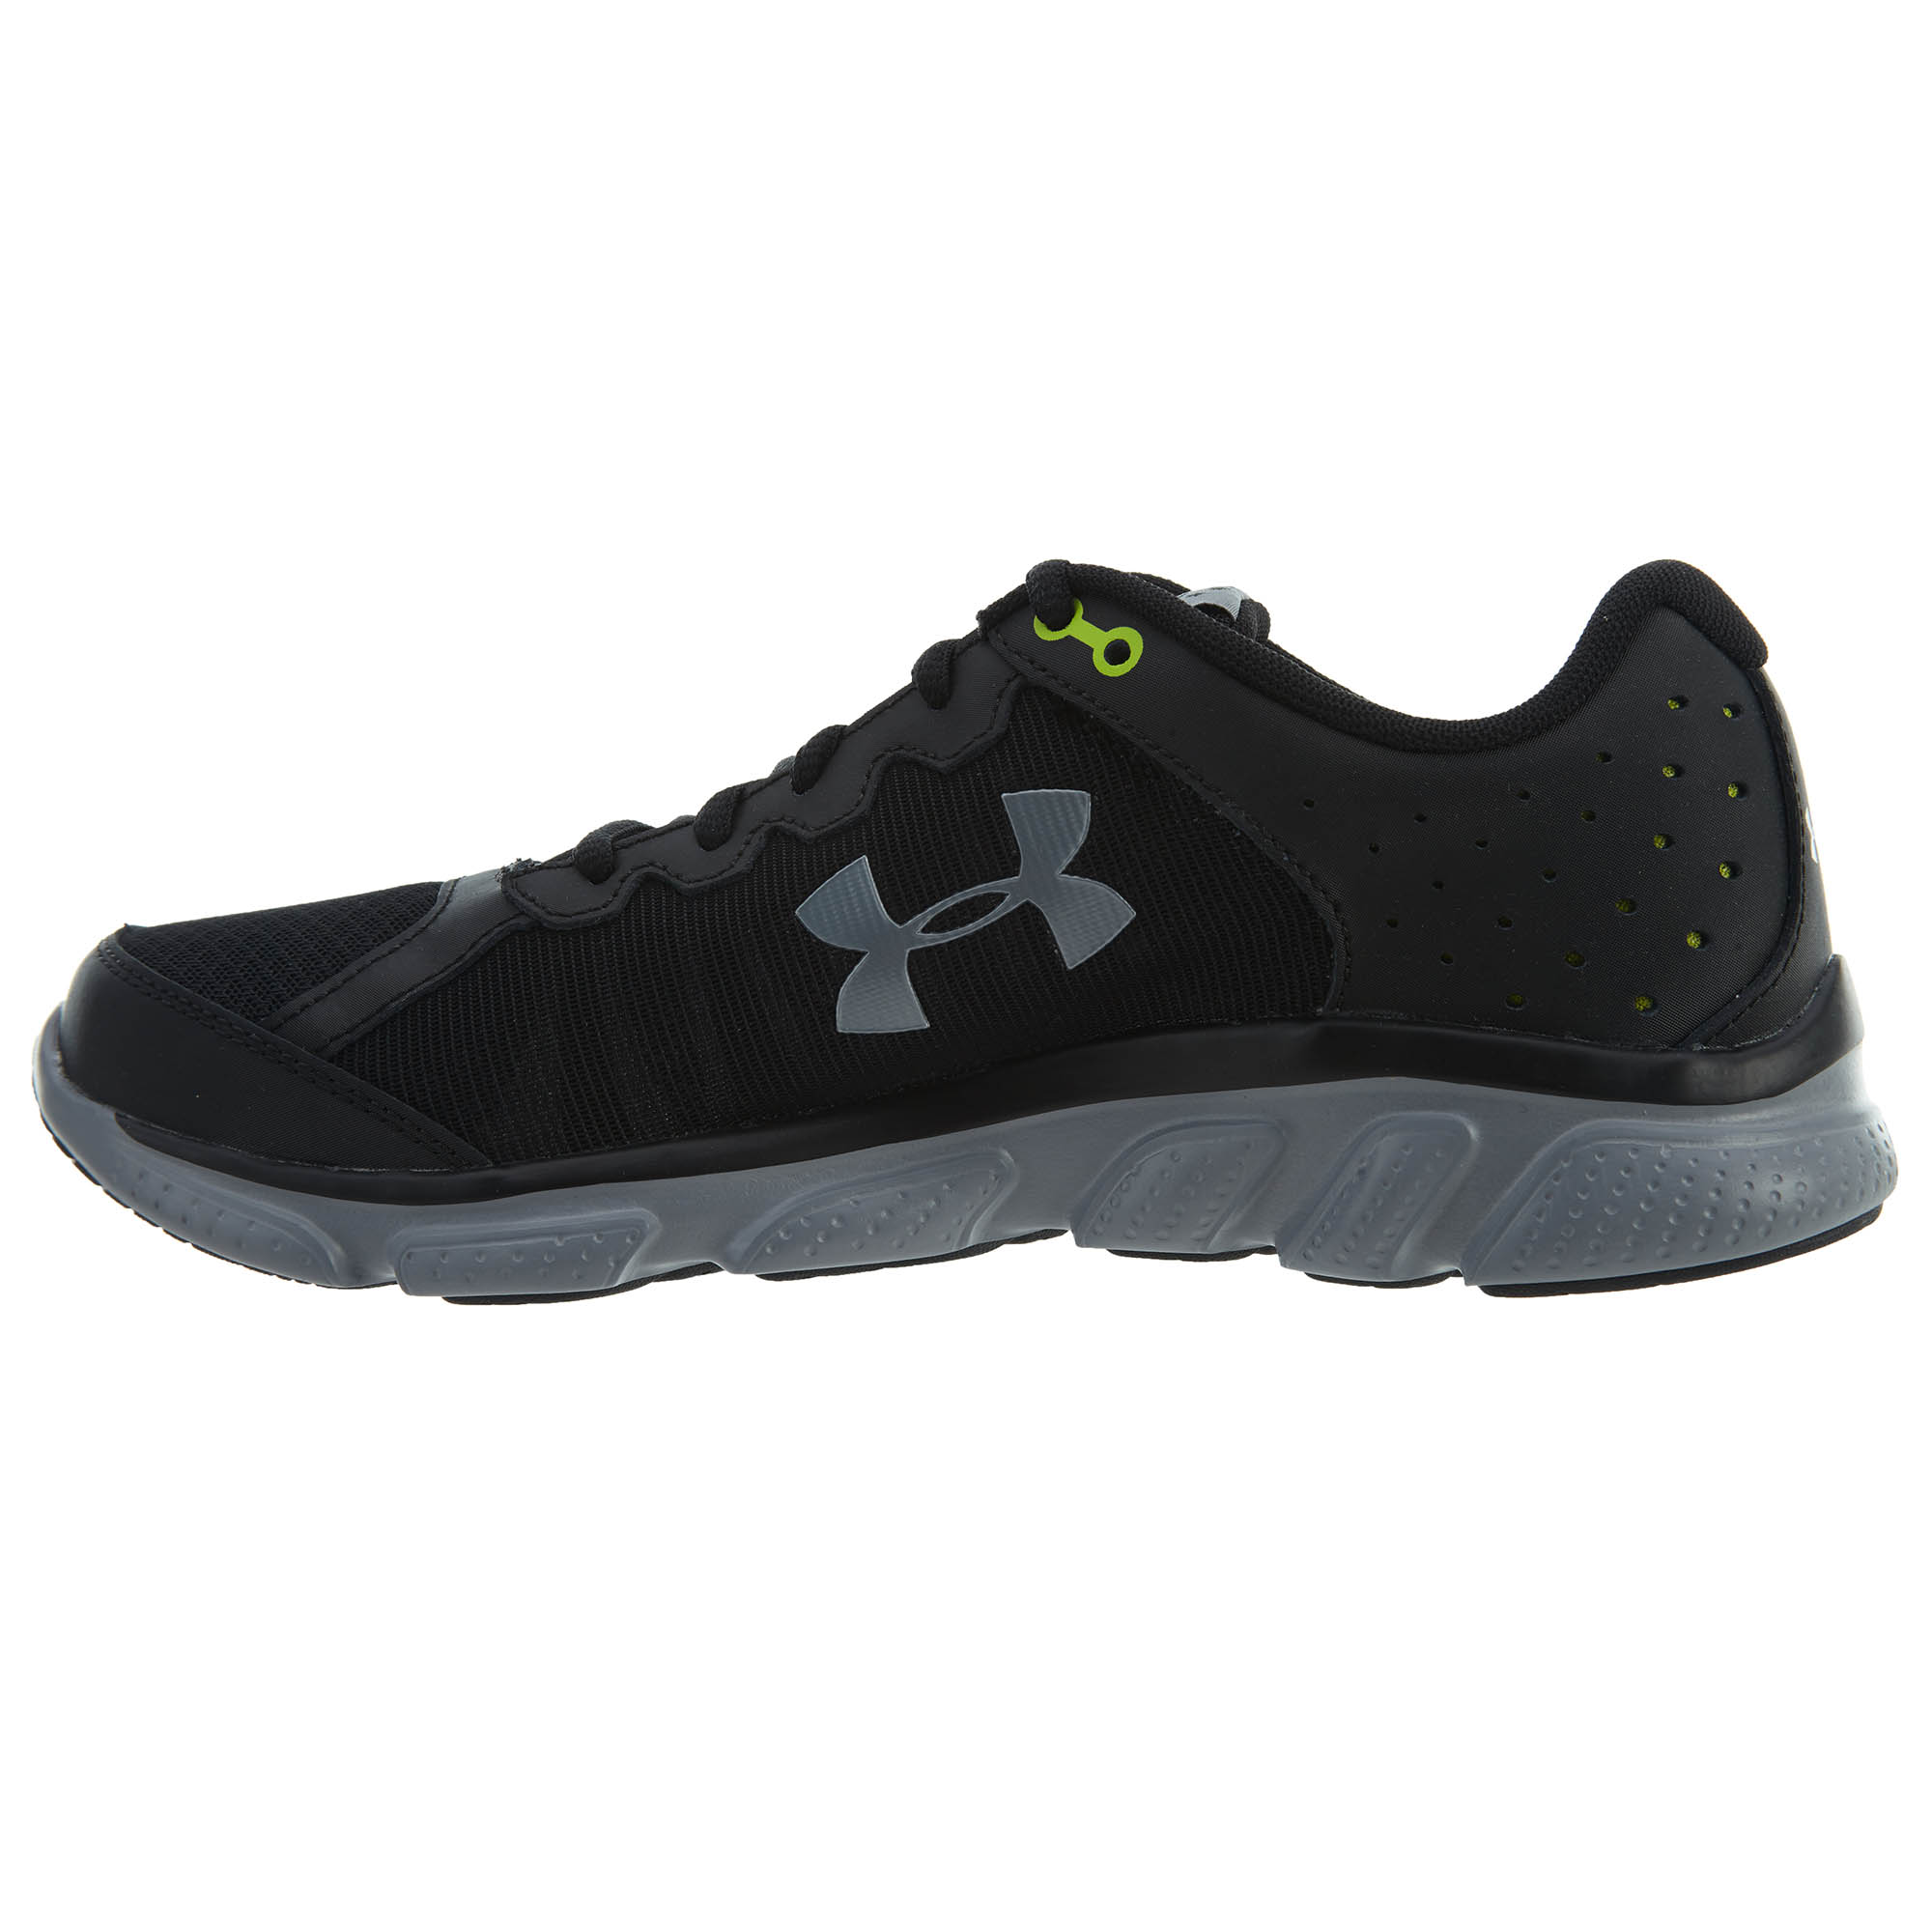 4dd781d71c6e9 Under Armour 130161300111.5 Freedom Assert 6 Men Running Black/Steel 11.5  Shoes